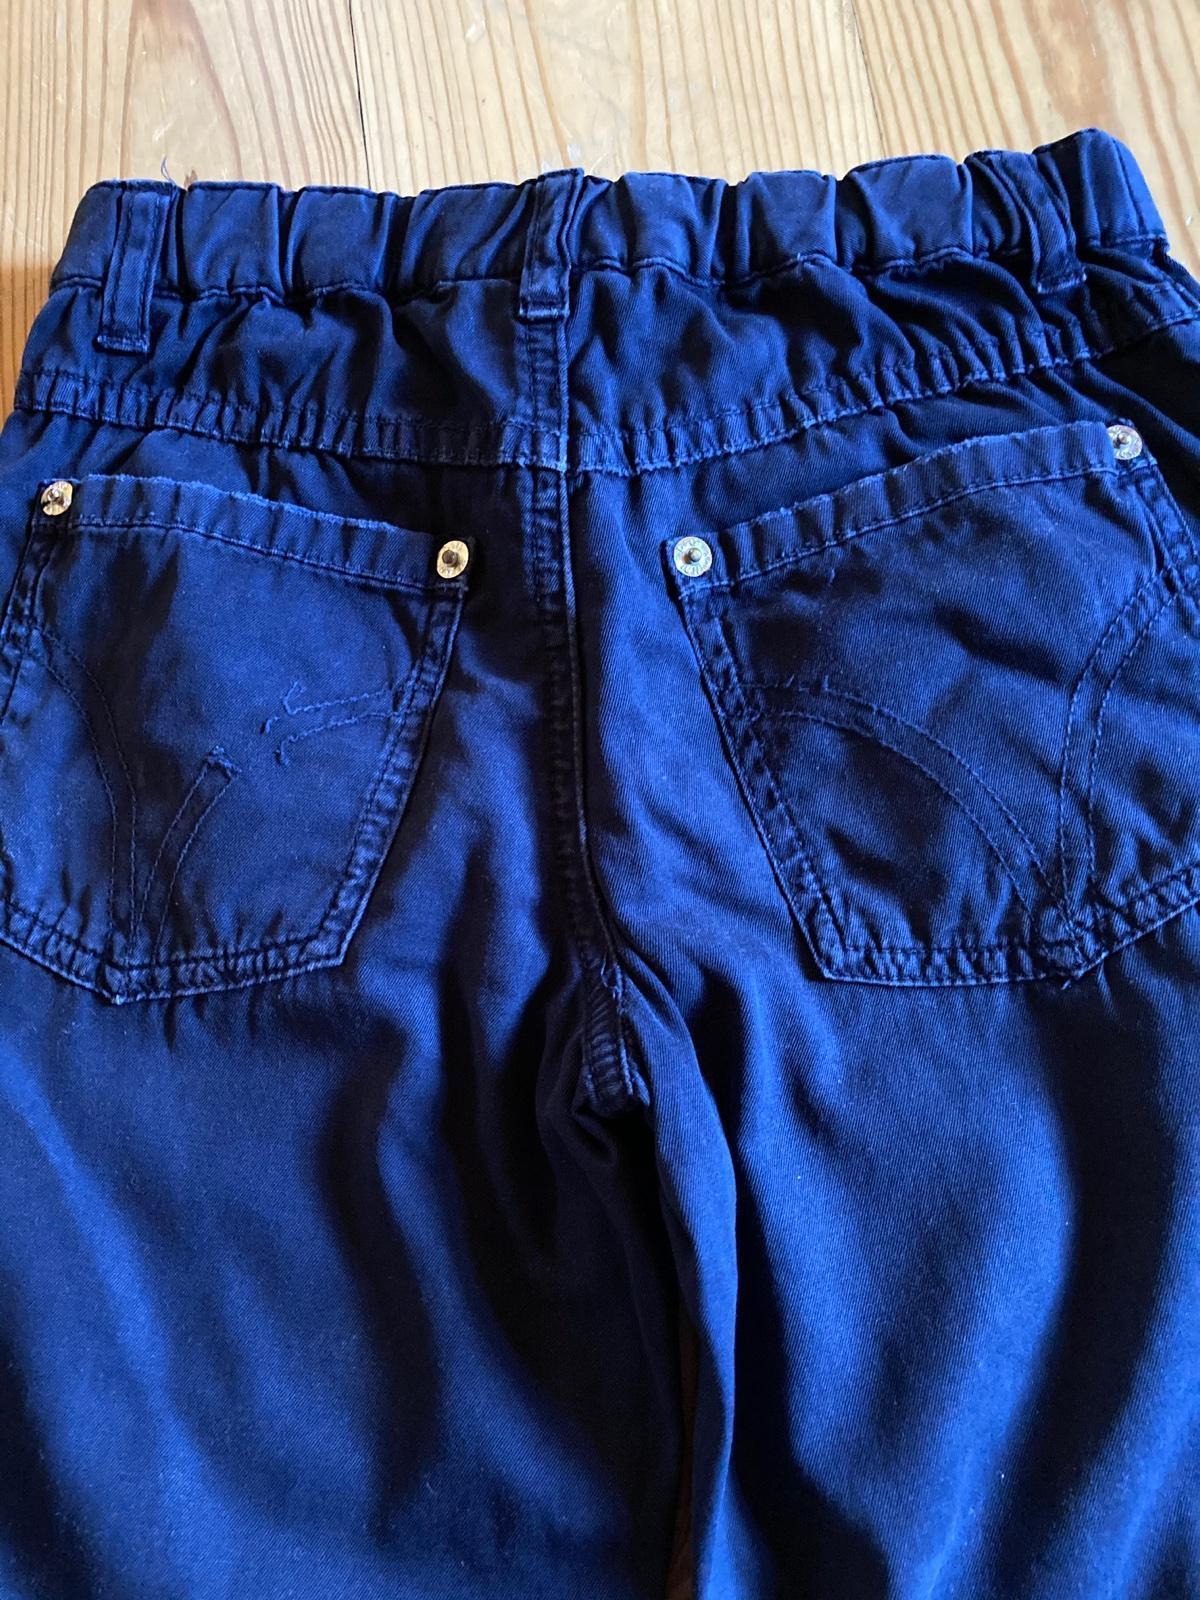 D&G Junior chlapčenské nohavice - Obrázok č. 2